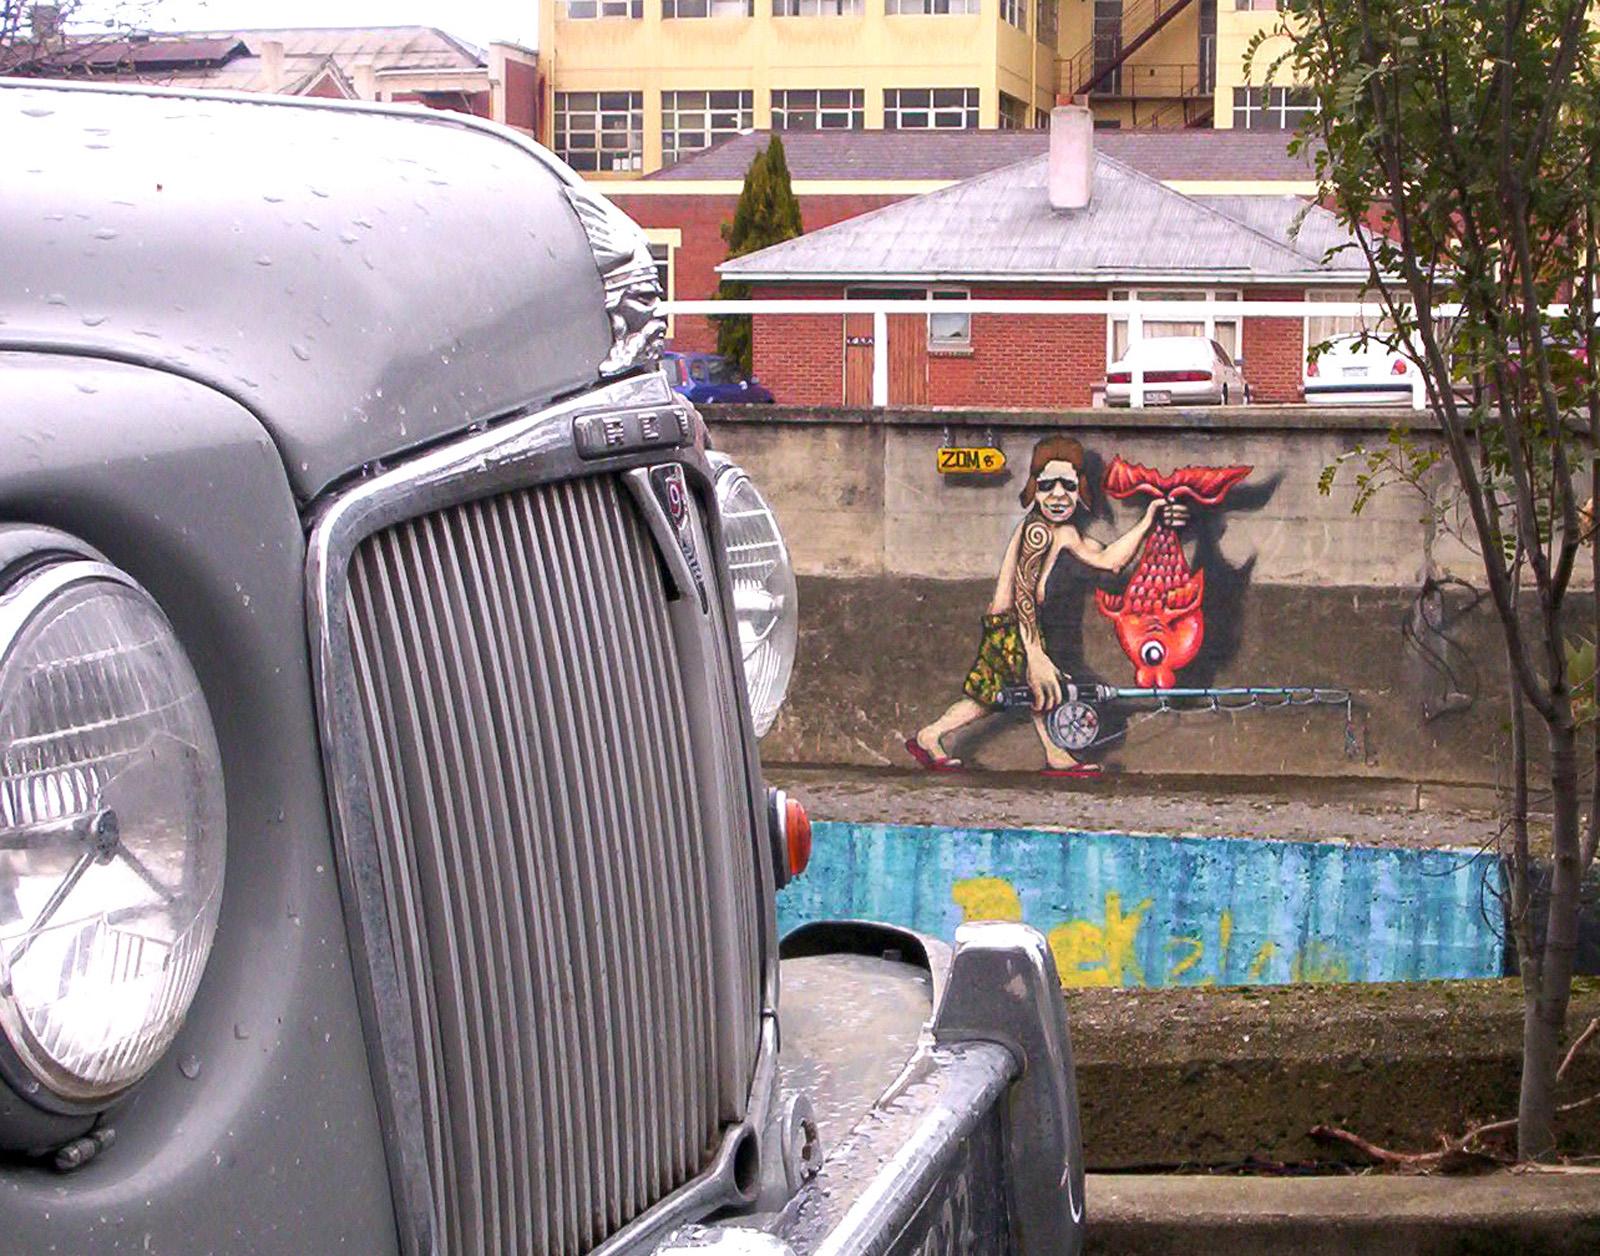 Aussie migrant under observation, Bspo06, Car, Dunedin, Graphiti, HQ Photo